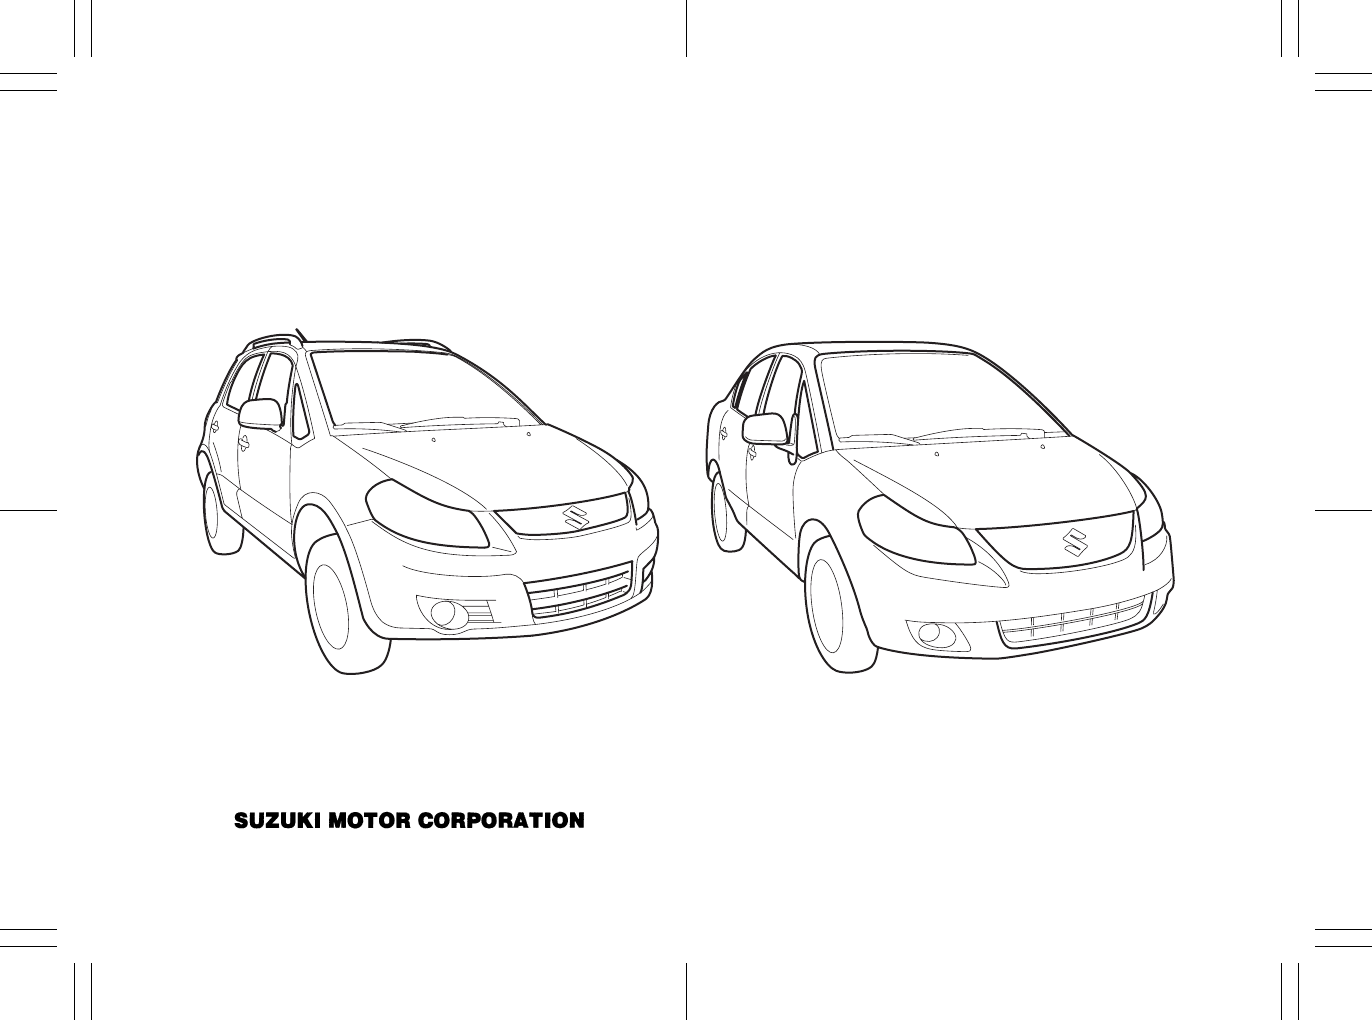 Suzuki 2010 Sx4 Owners Manual Fuse Box